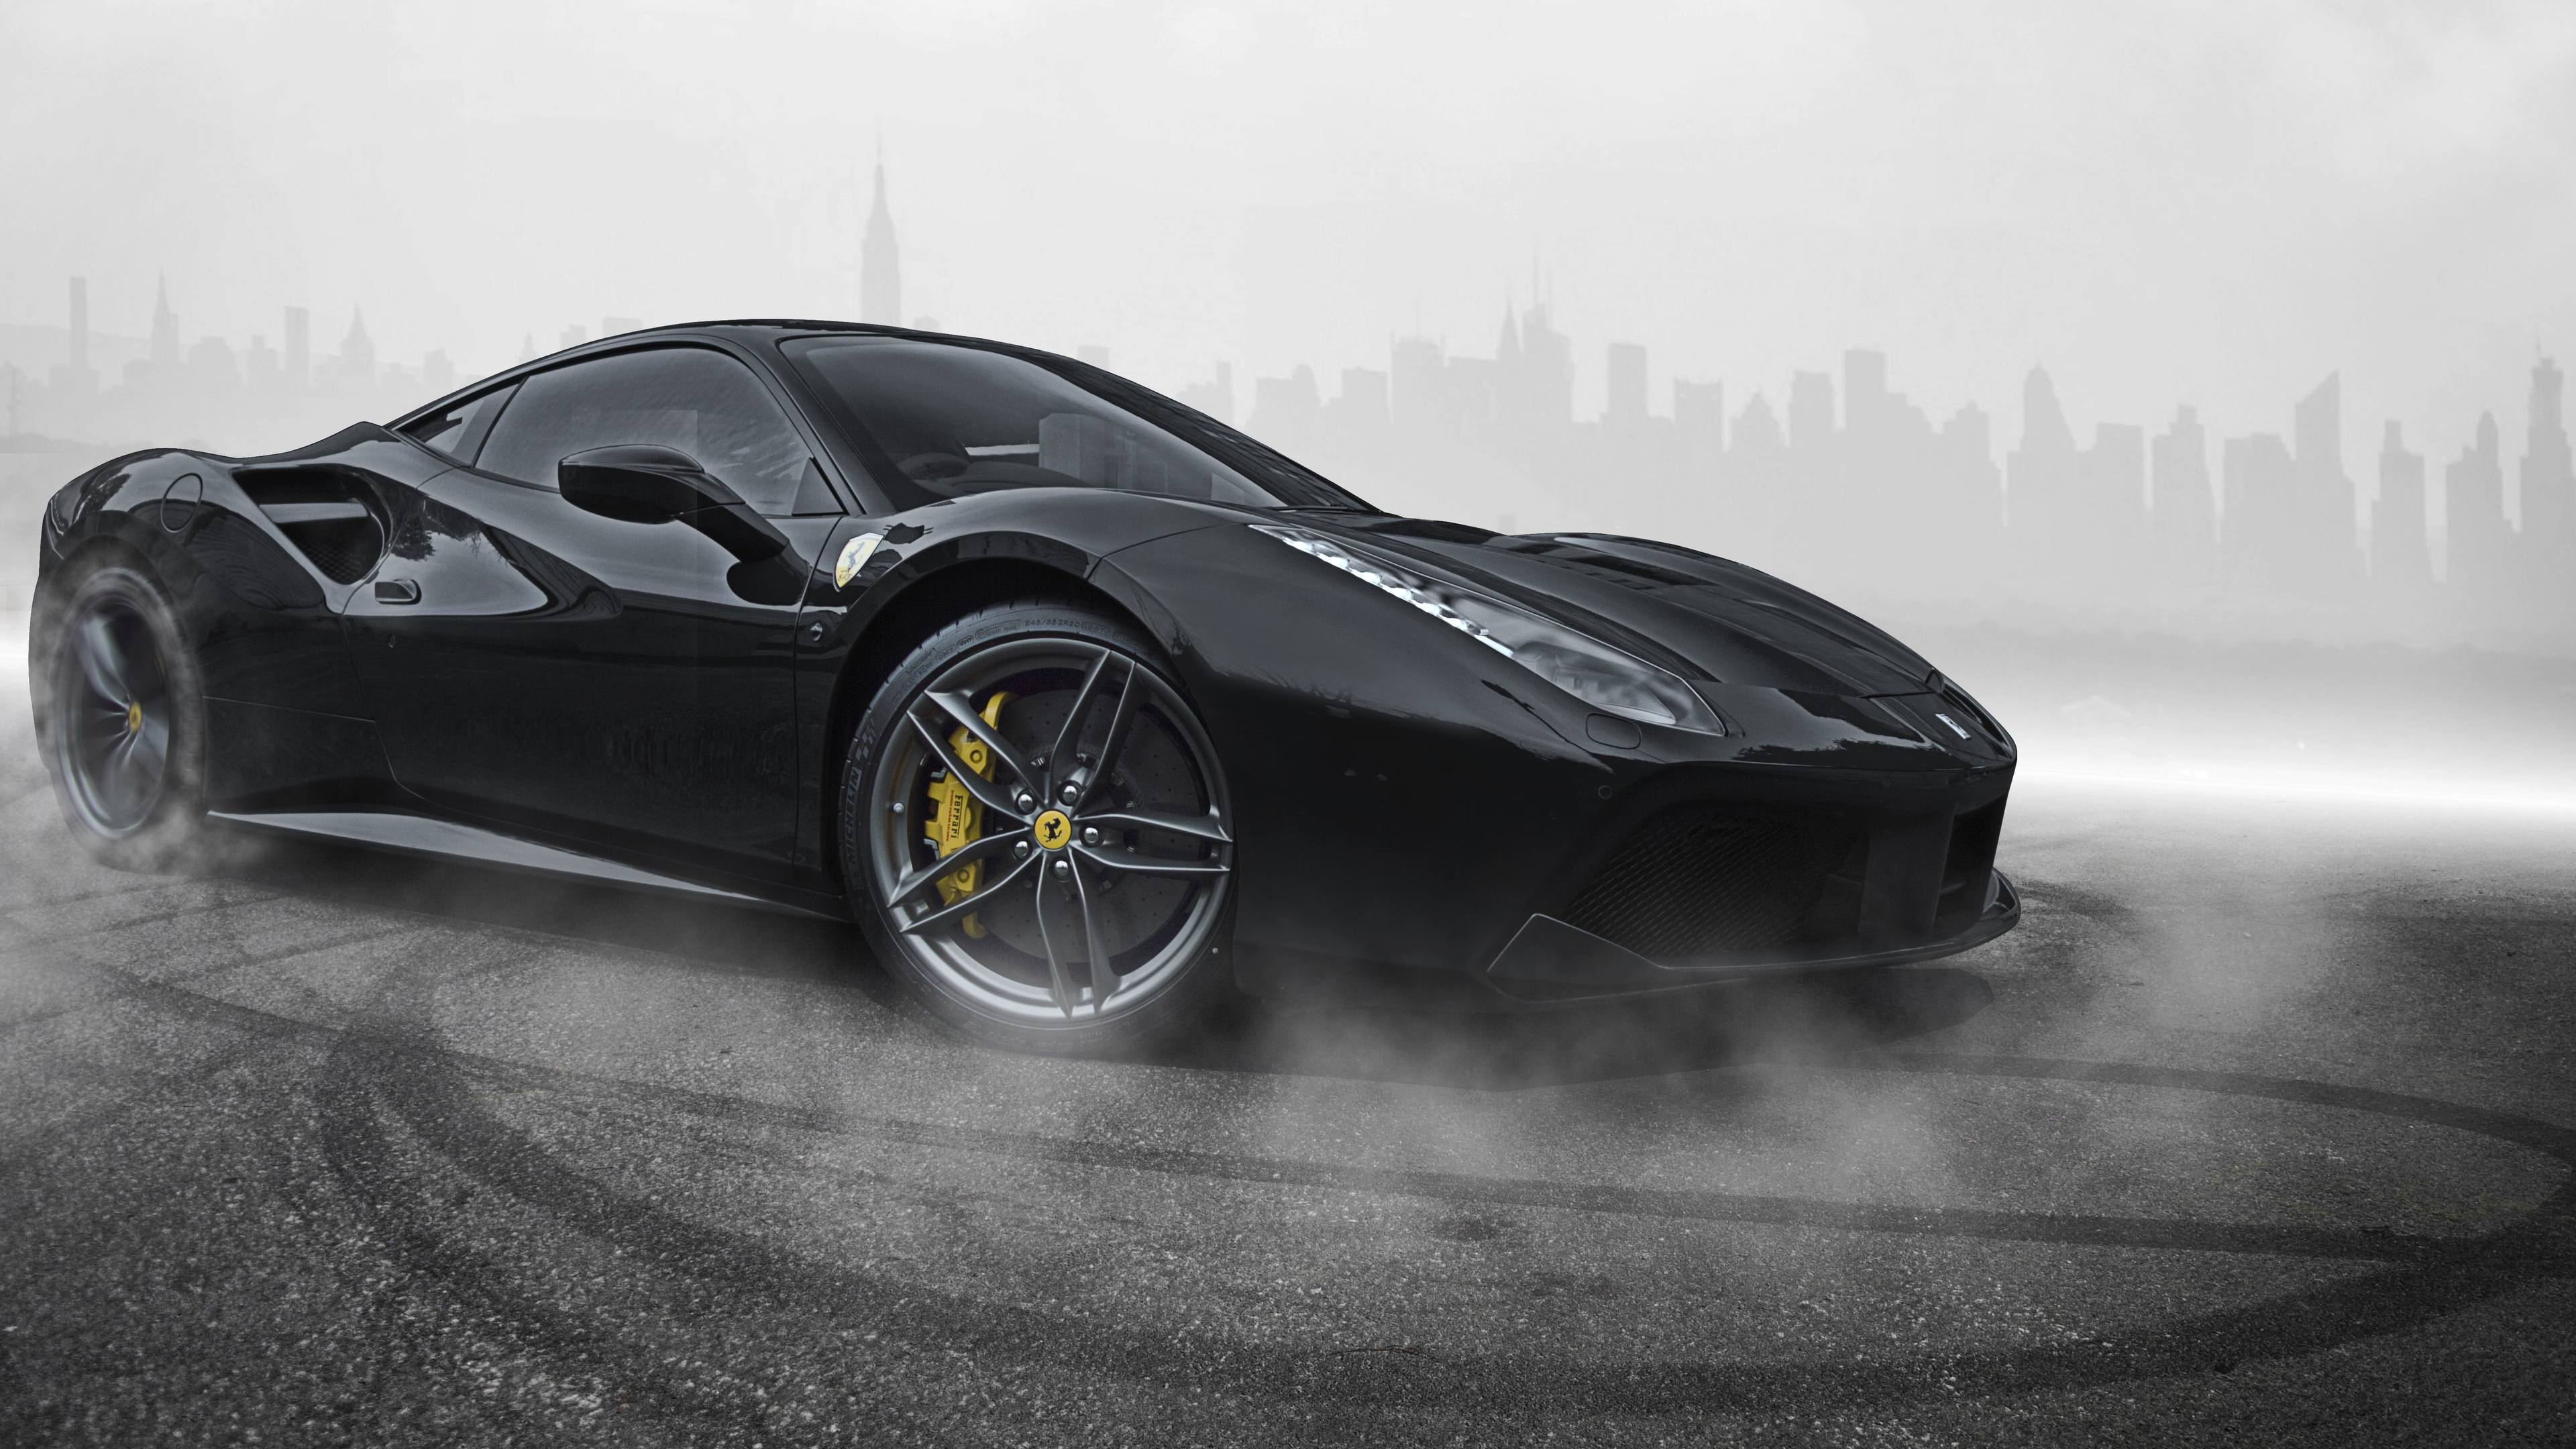 ferrari 488 black 4k 1546362099 - Ferrari 488 Black 4k - hd-wallpapers, ferrari wallpapers, ferrari 488 wallpapers, cars wallpapers, 5k wallpapers, 4k-wallpapers